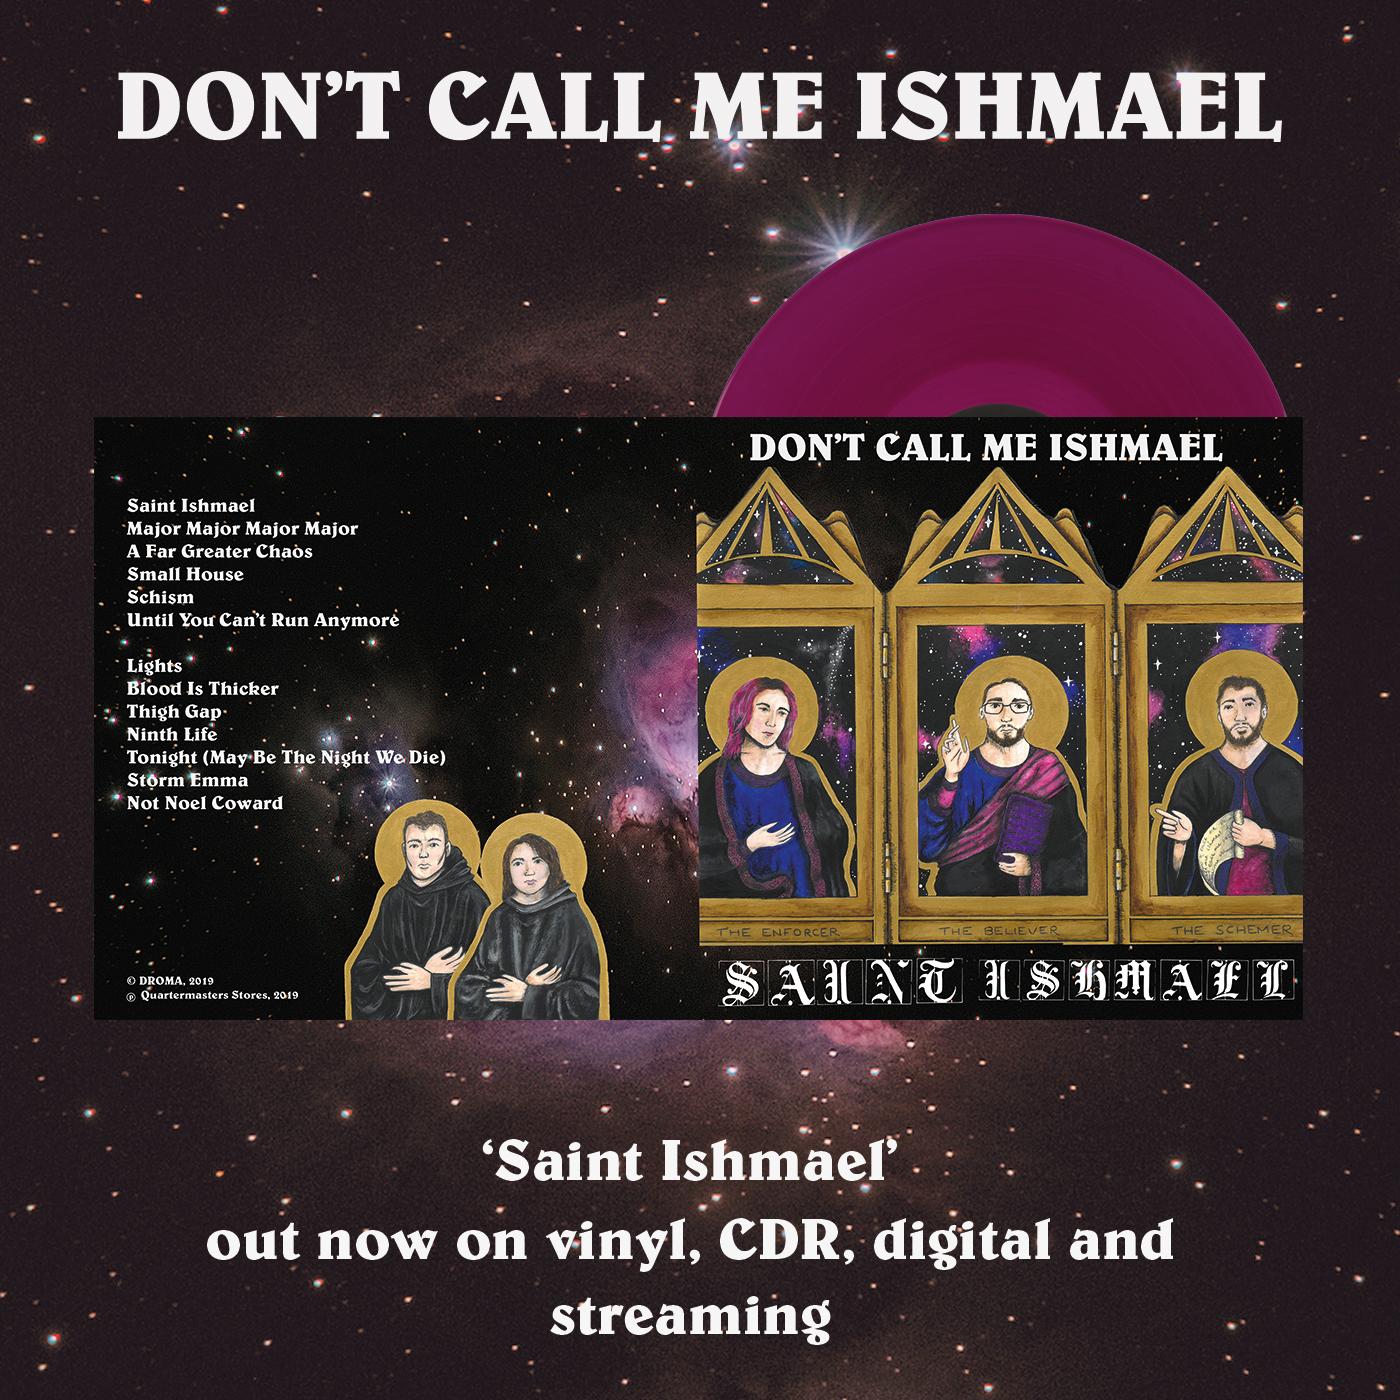 Saint Ish released.jpg